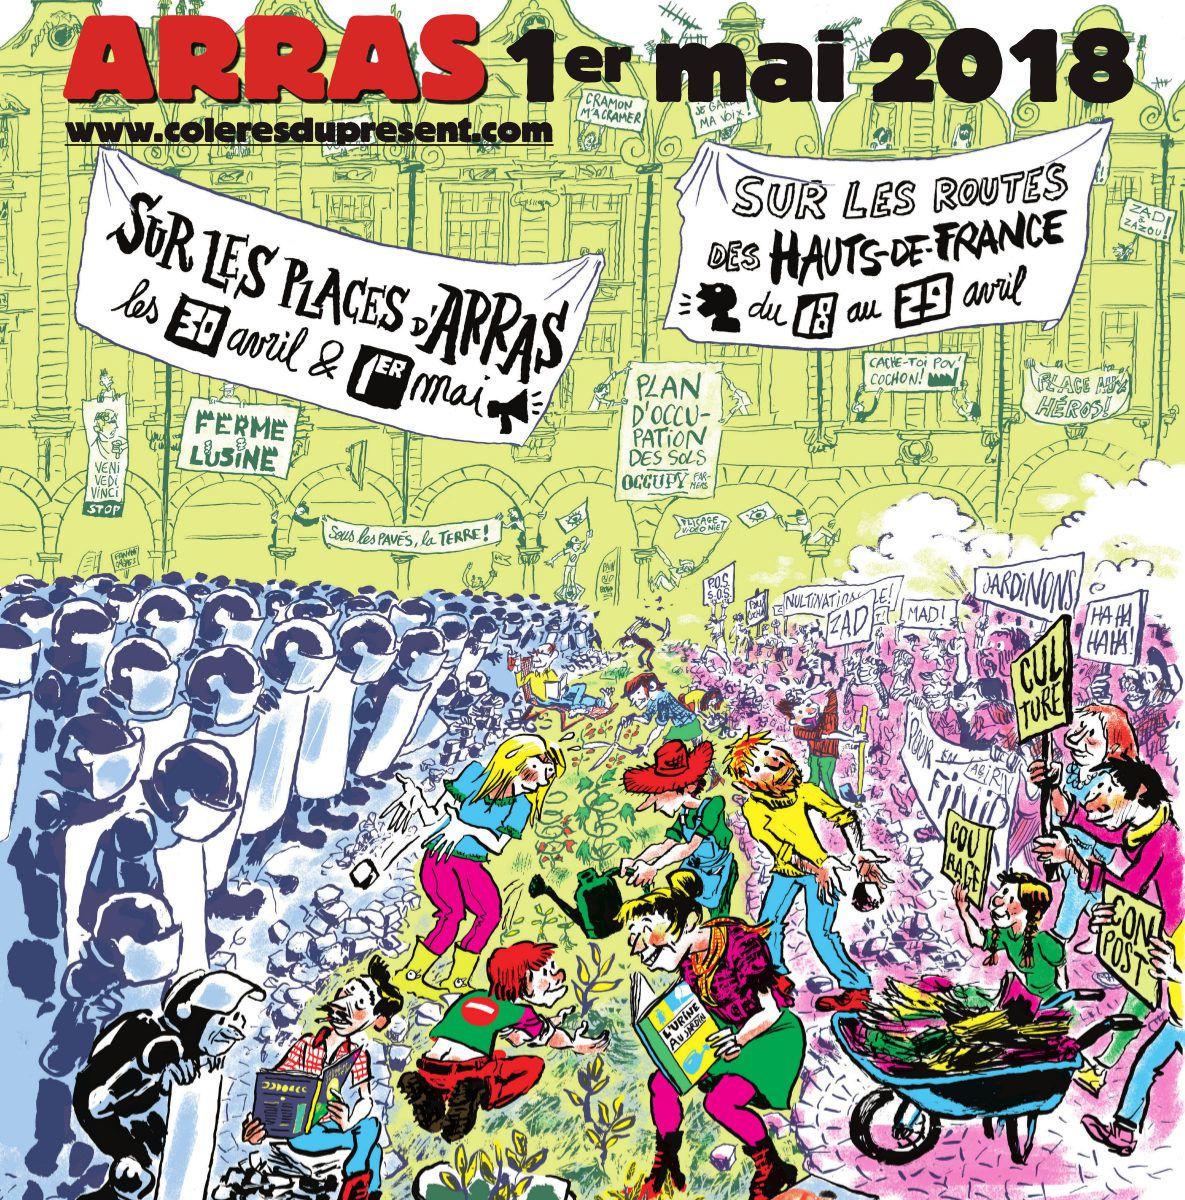 Le 1er mai, 813 est à Arras.